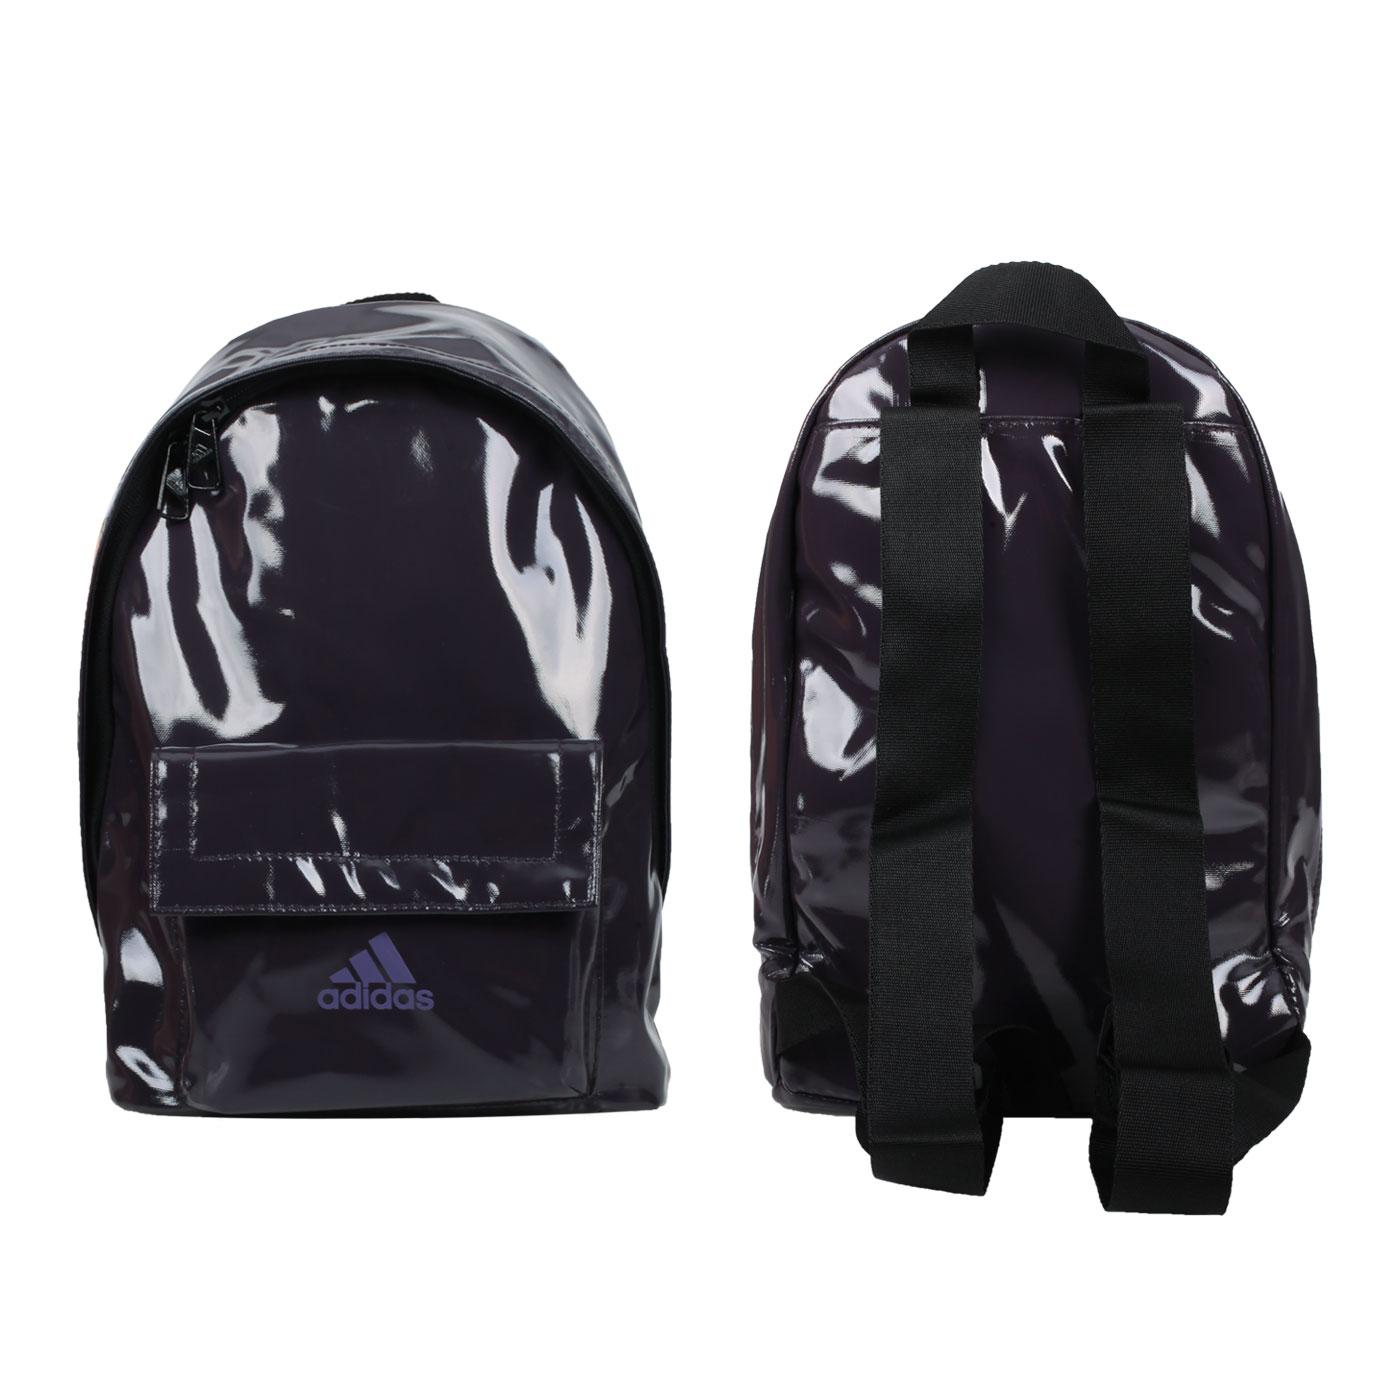 ADIDAS 小型後背包 FS2944 - 深葡萄紫